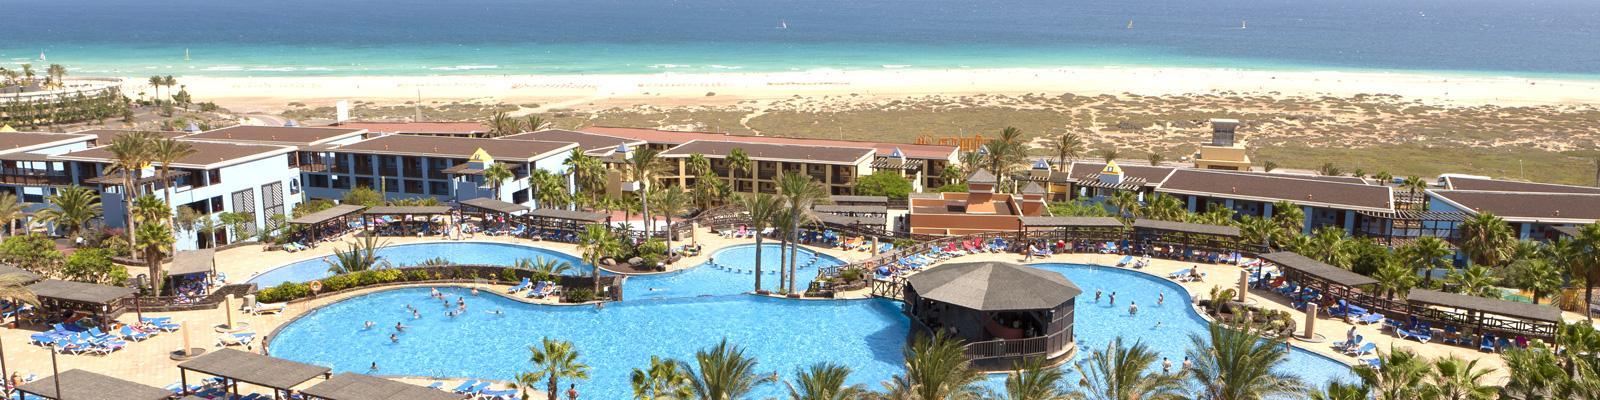 Barcelo Jandia Playa - Hotel Fuerteventura